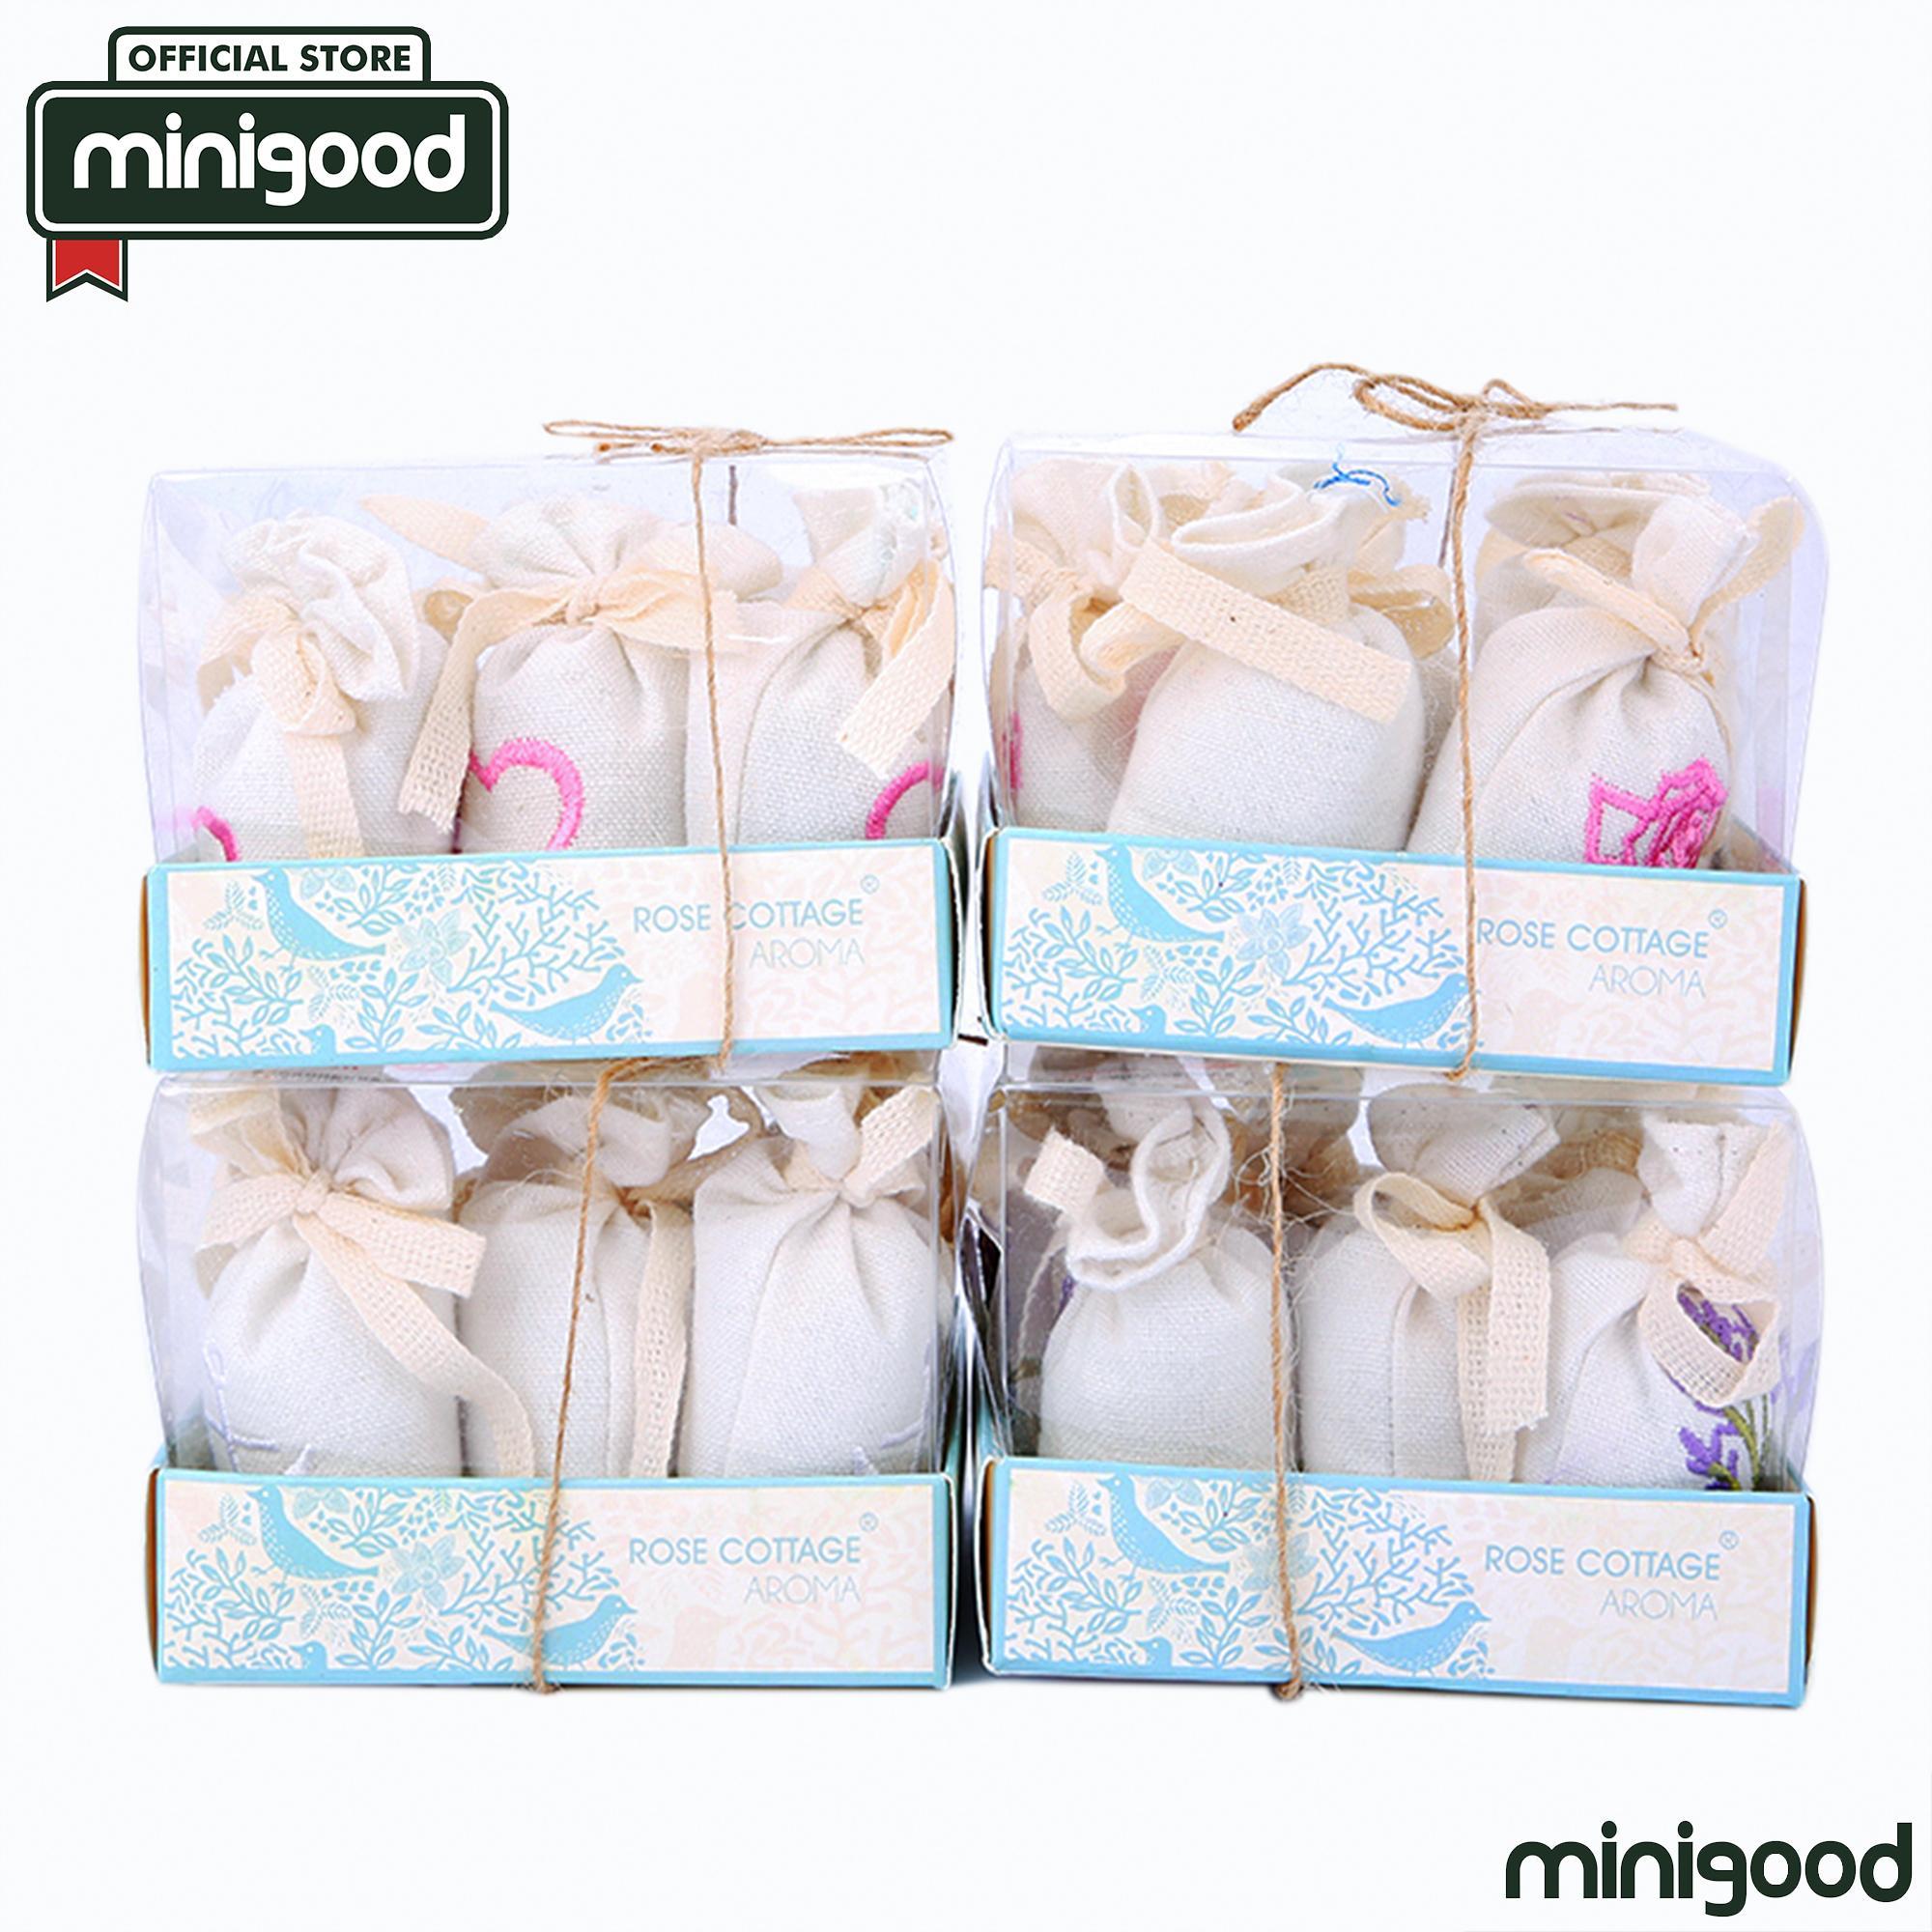 minigood TERBARU pengharum ruangan sachet wangi bunga segar tahan lama desain tas rajut 6Bags